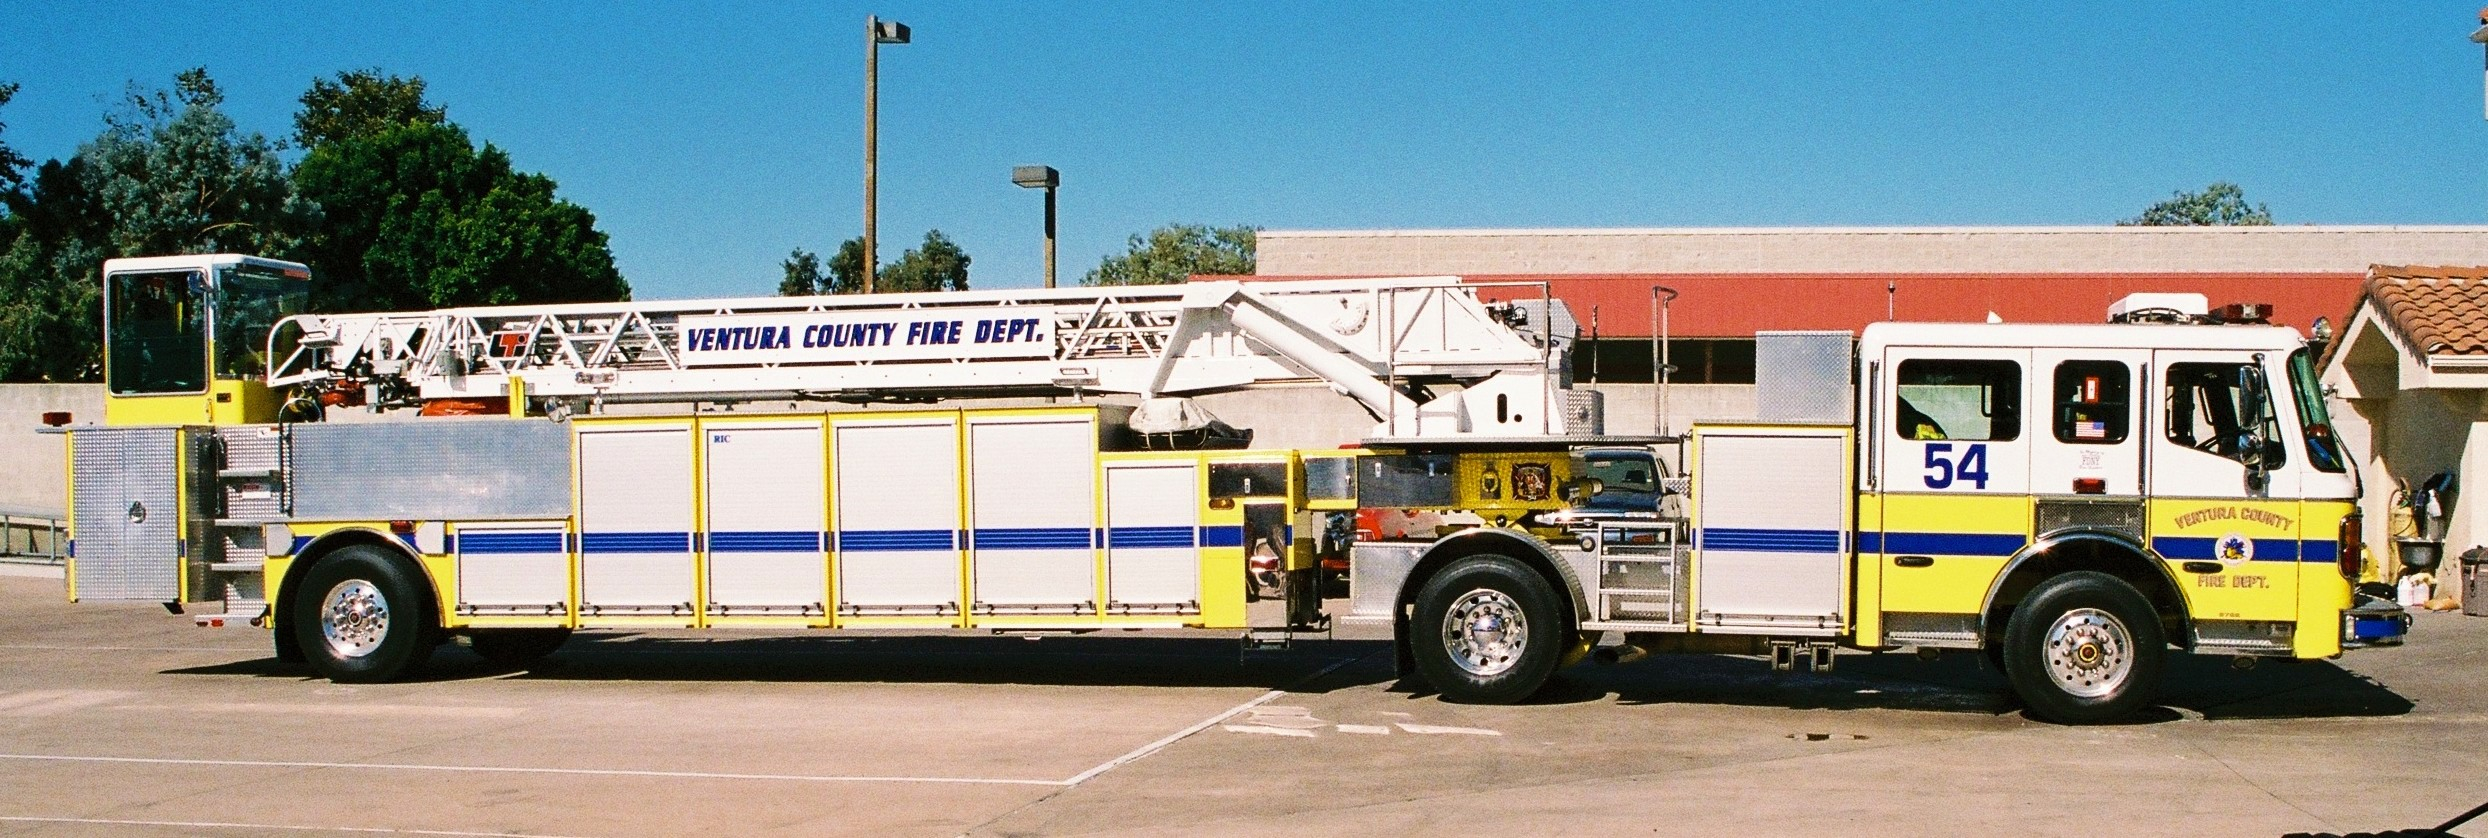 Ventura County_FS54_T54_2006 ALF-Becker-LTI_105ft_TDA_Pano-1.jpg